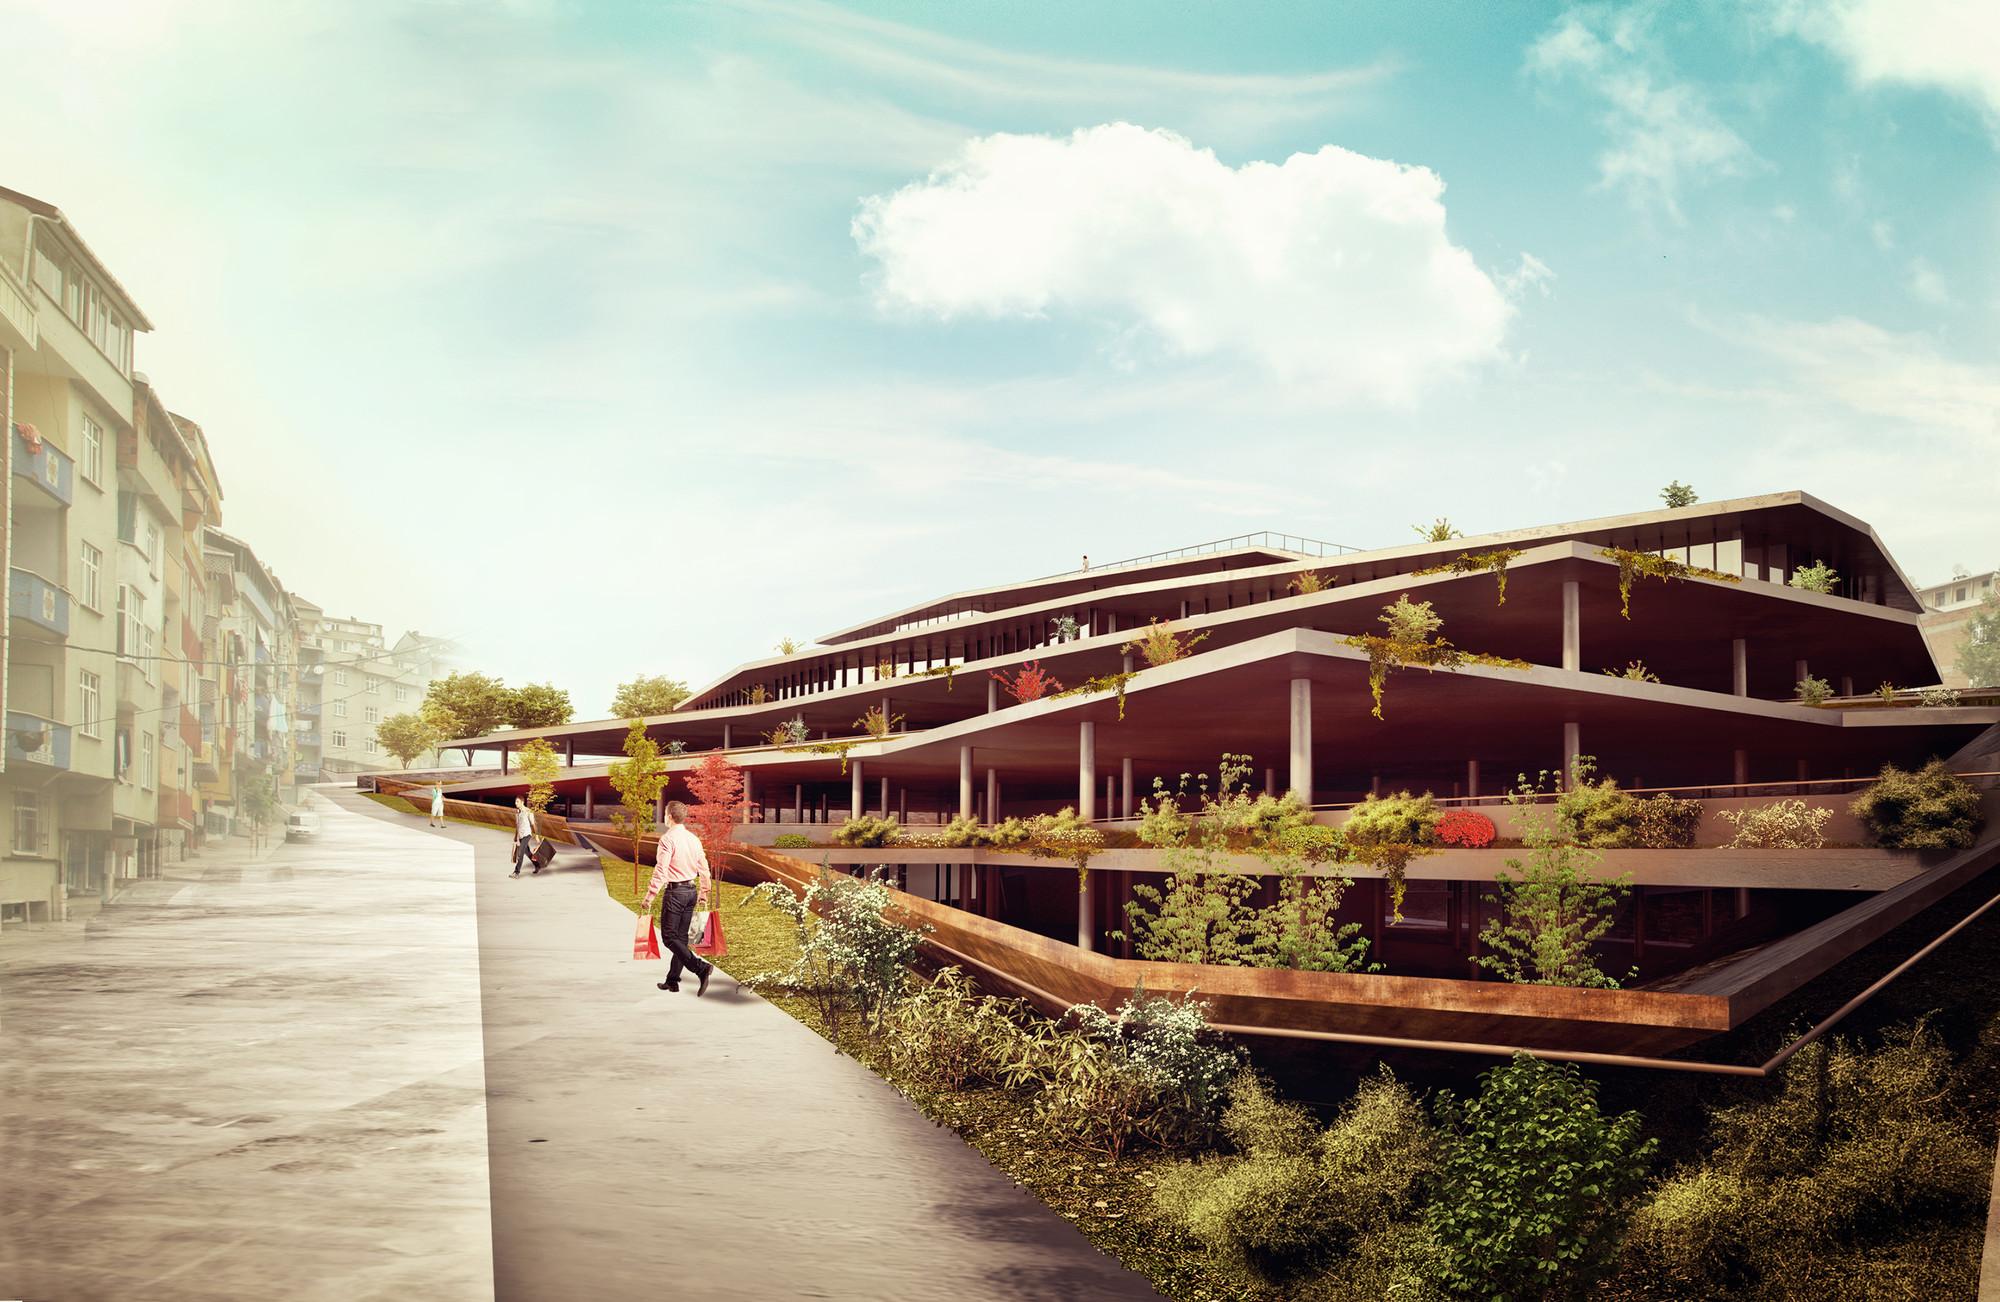 Suyabatmaz Demirel Proposes Terraced Market Hall for Sultangazi , Exterior View. Image © Suyabatmaz Demirel Architects